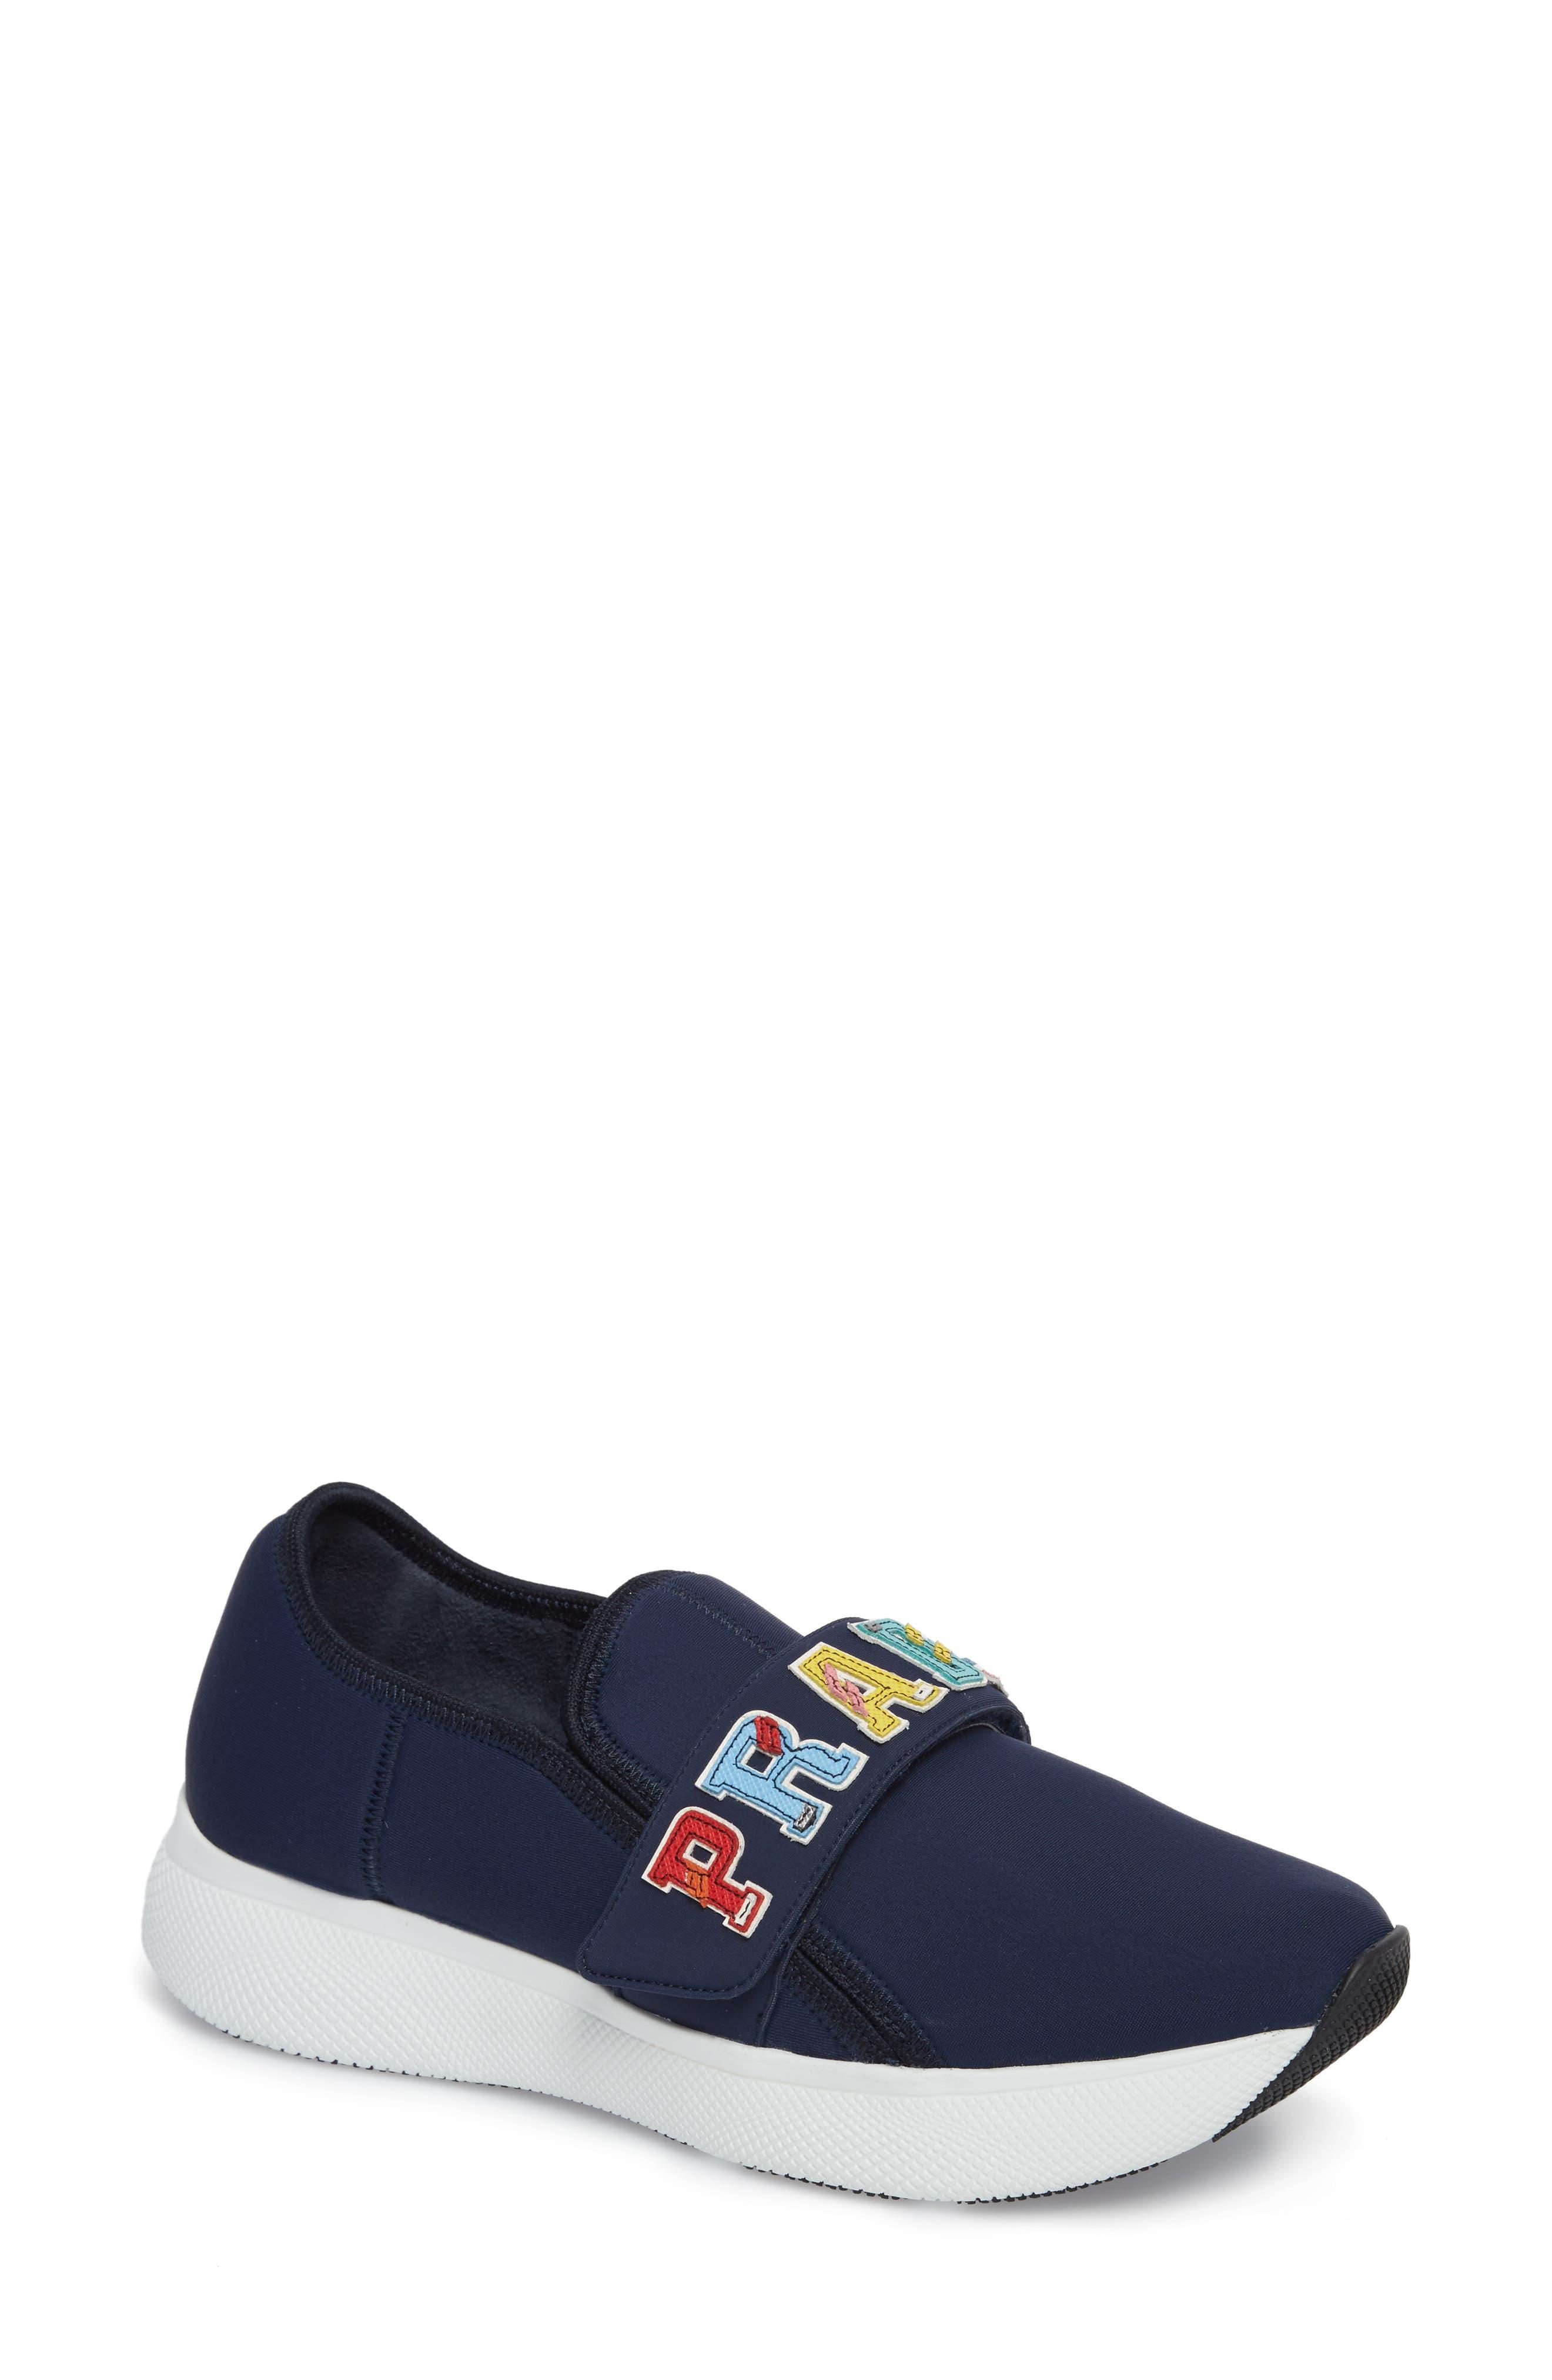 Main Image - Prada Logo Strap Low Top Sneaker (Women)